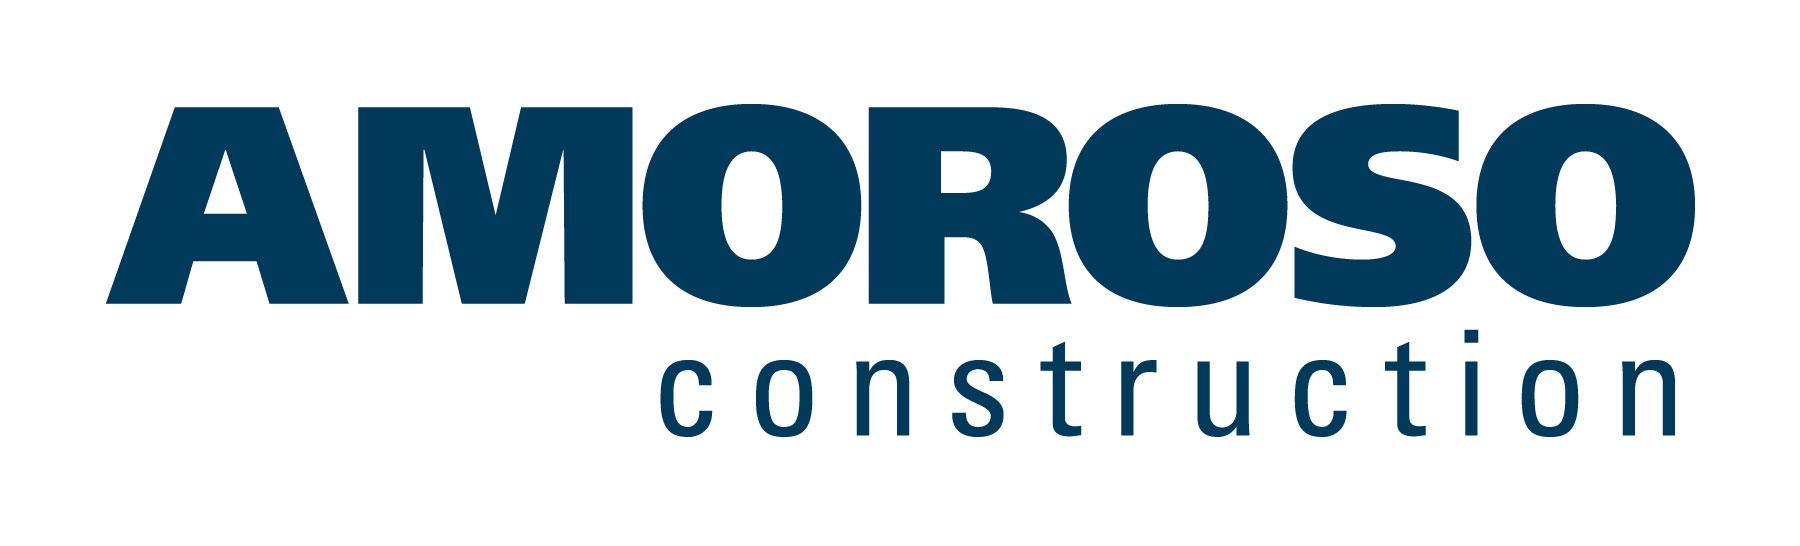 S. J. Amoroso Construction Co., Inc.